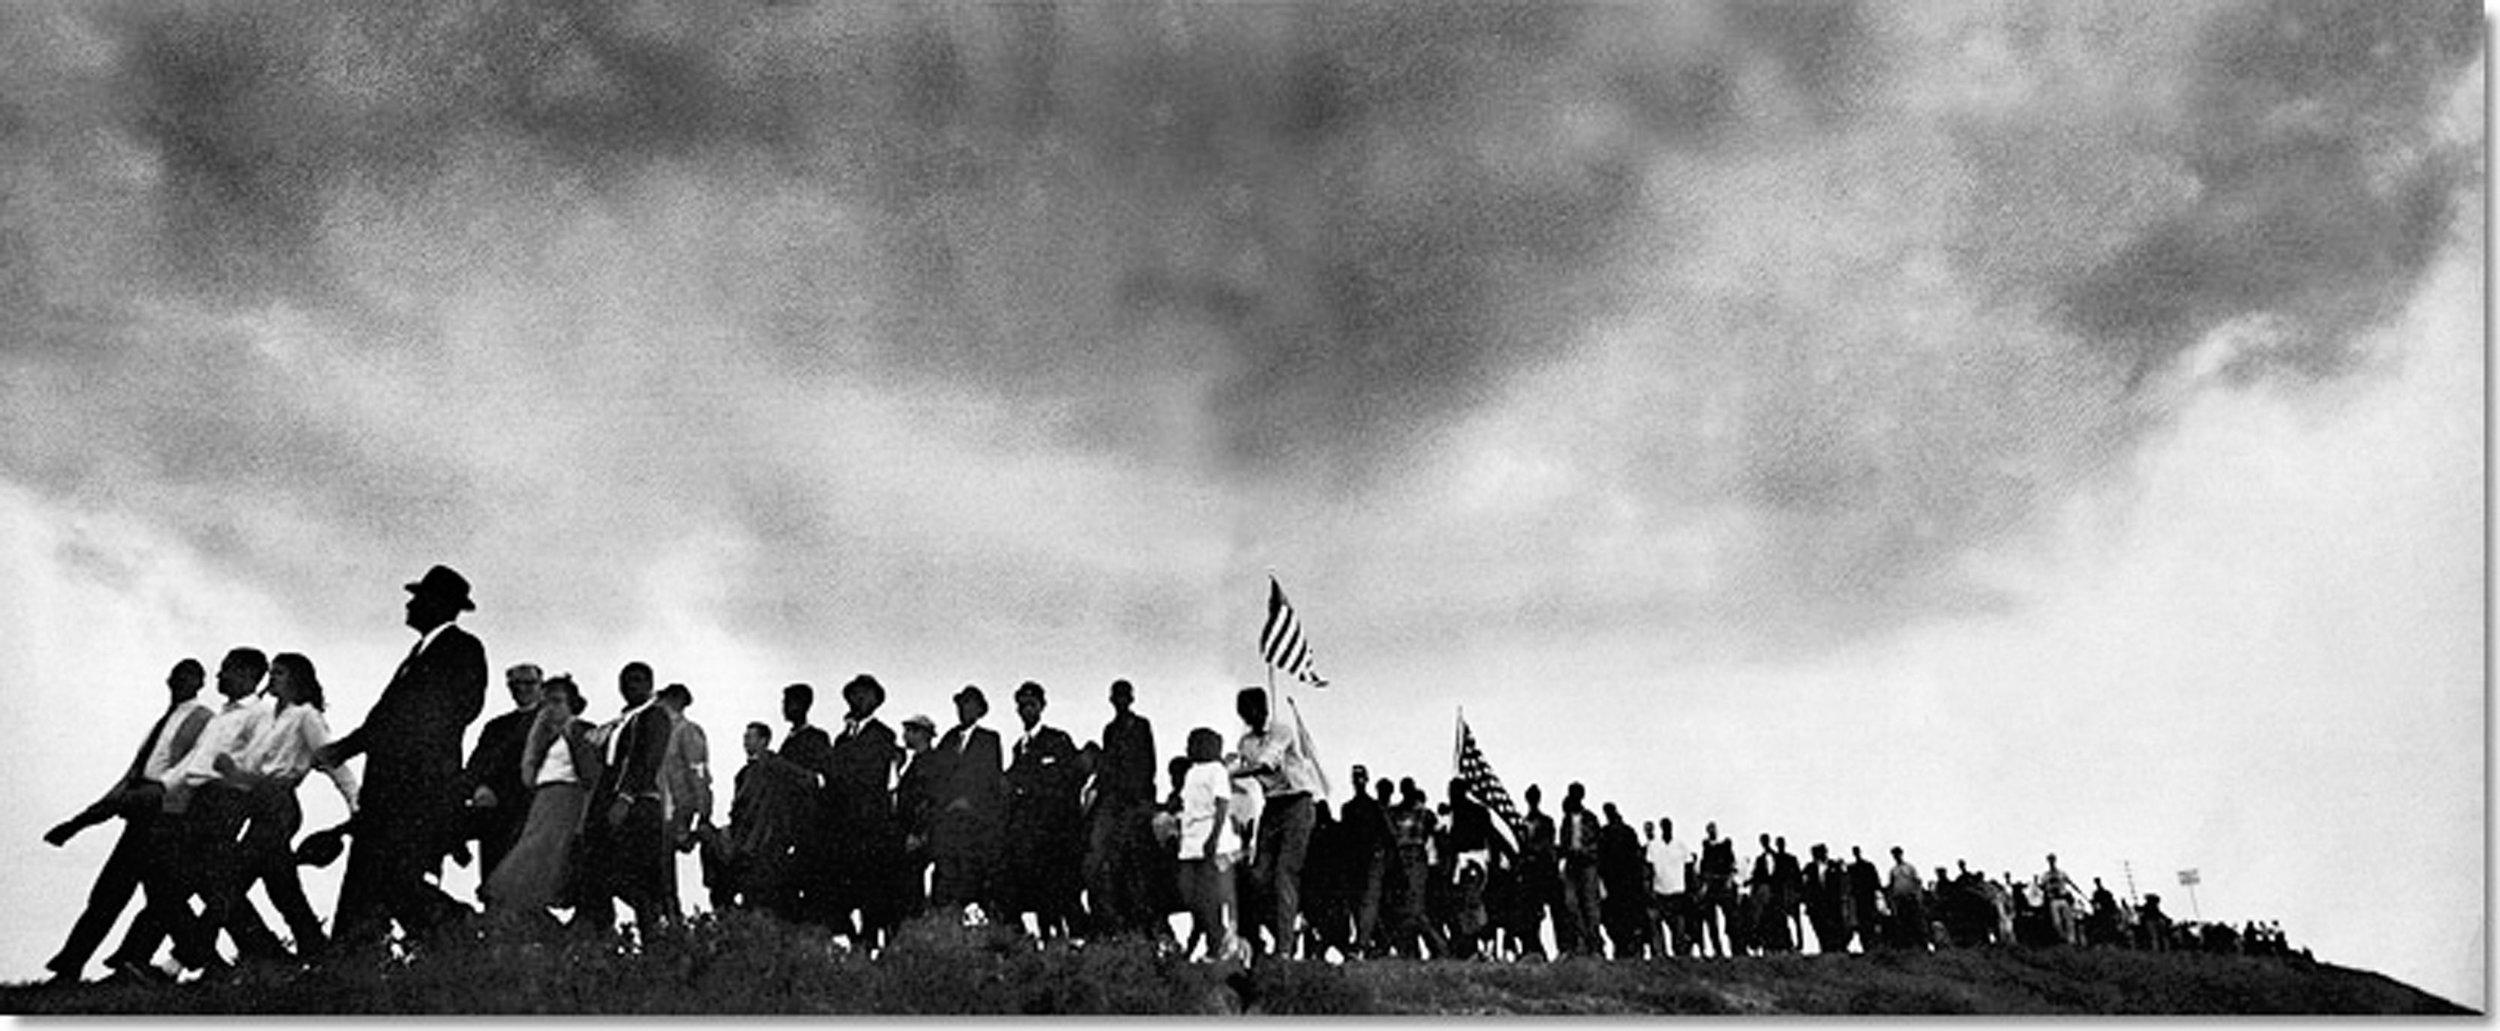 Freedom-March-Selma-to-Montgomery-1965.jpg